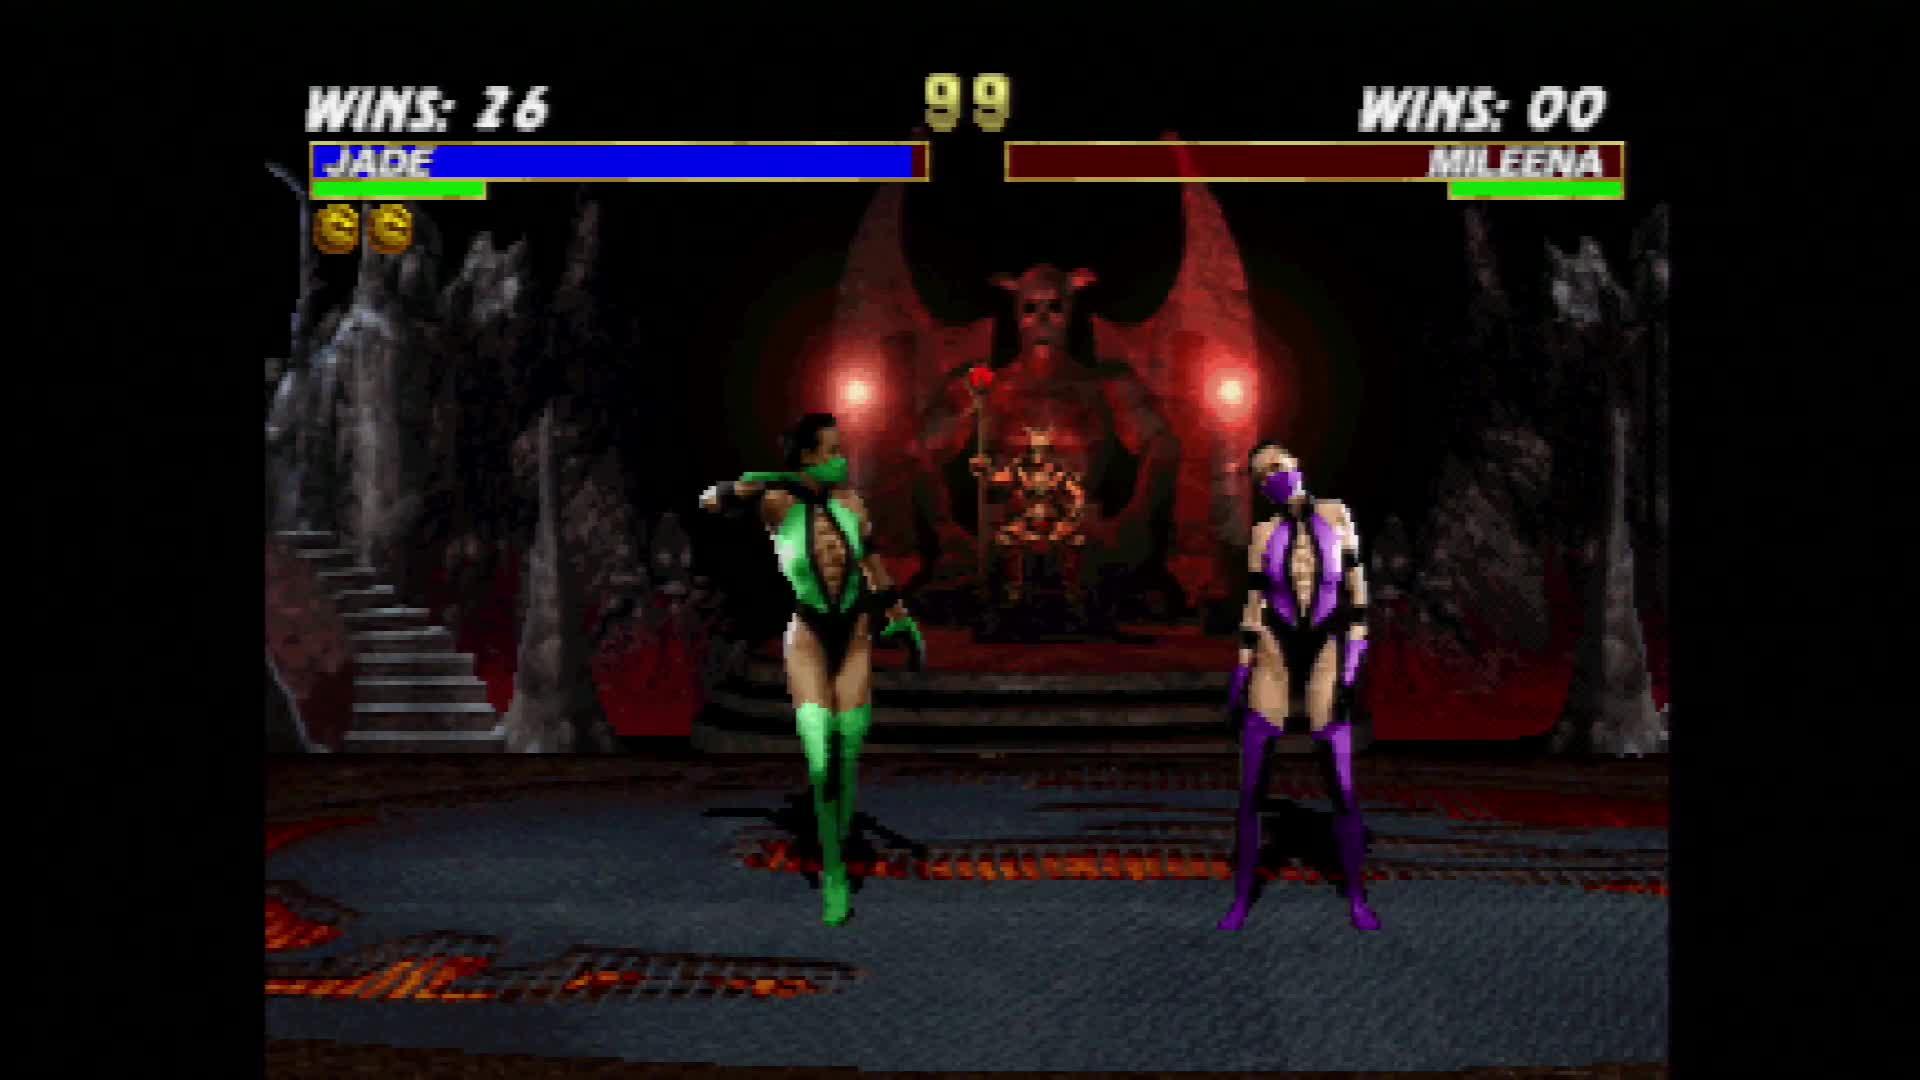 #elgatogaming, game, gaming, great, ray dhimitri, Mortal Kombat Trilogy - All JADE Fatalities GIFs